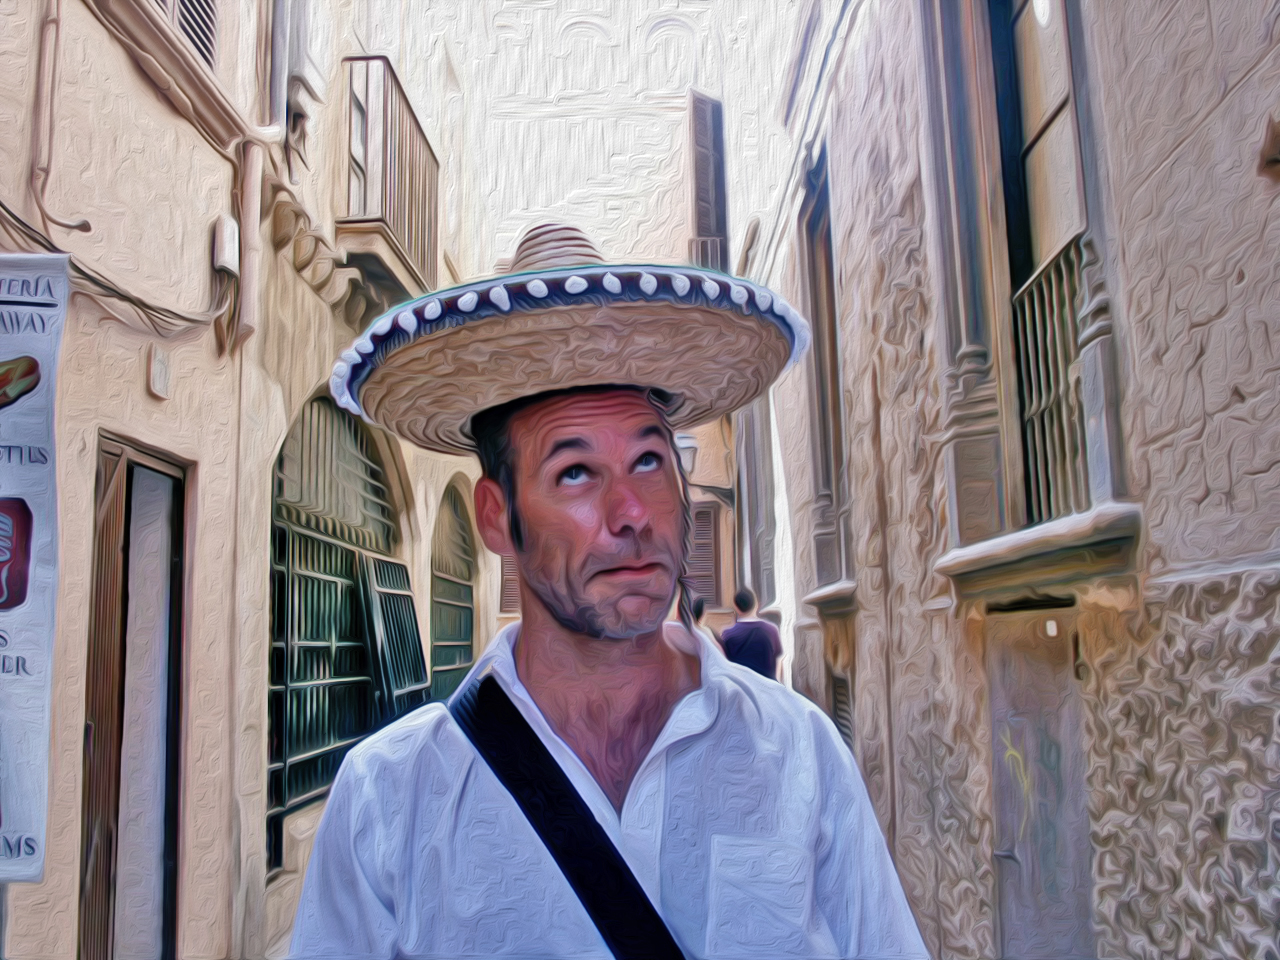 Foto nachmalen lassen - Sombrero